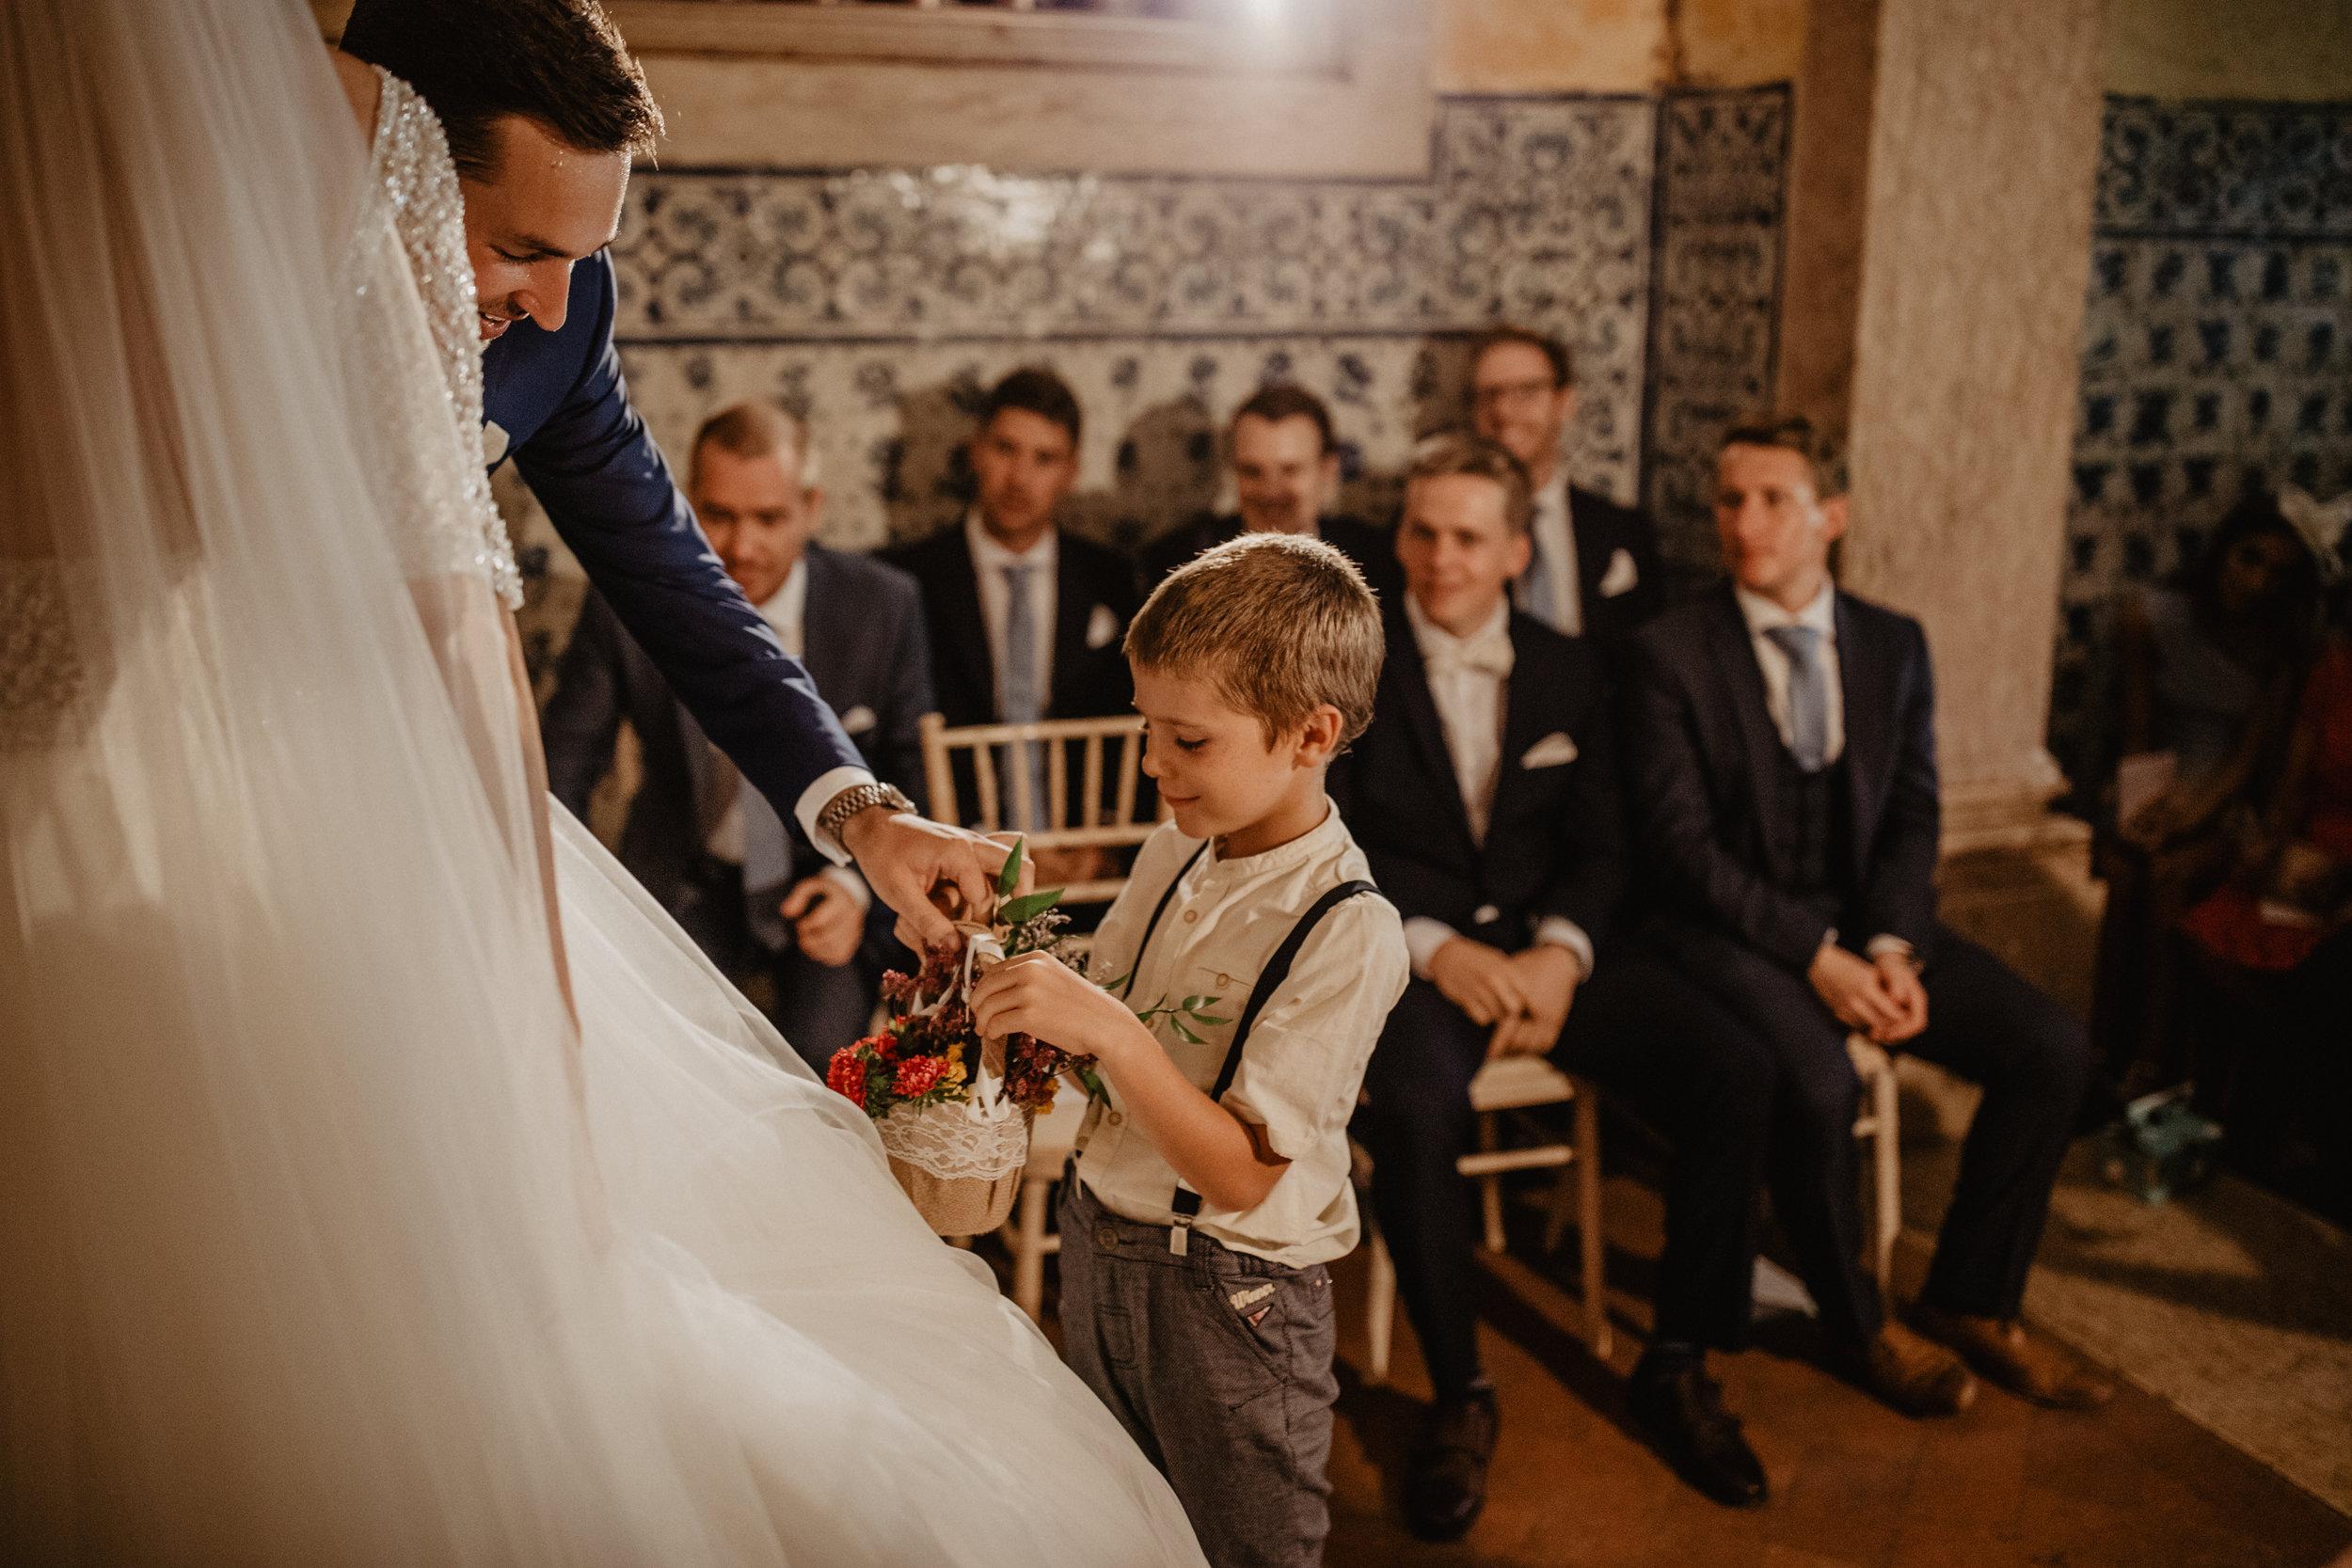 Lapela-photography-wedding-sintra-portugal-62.jpg